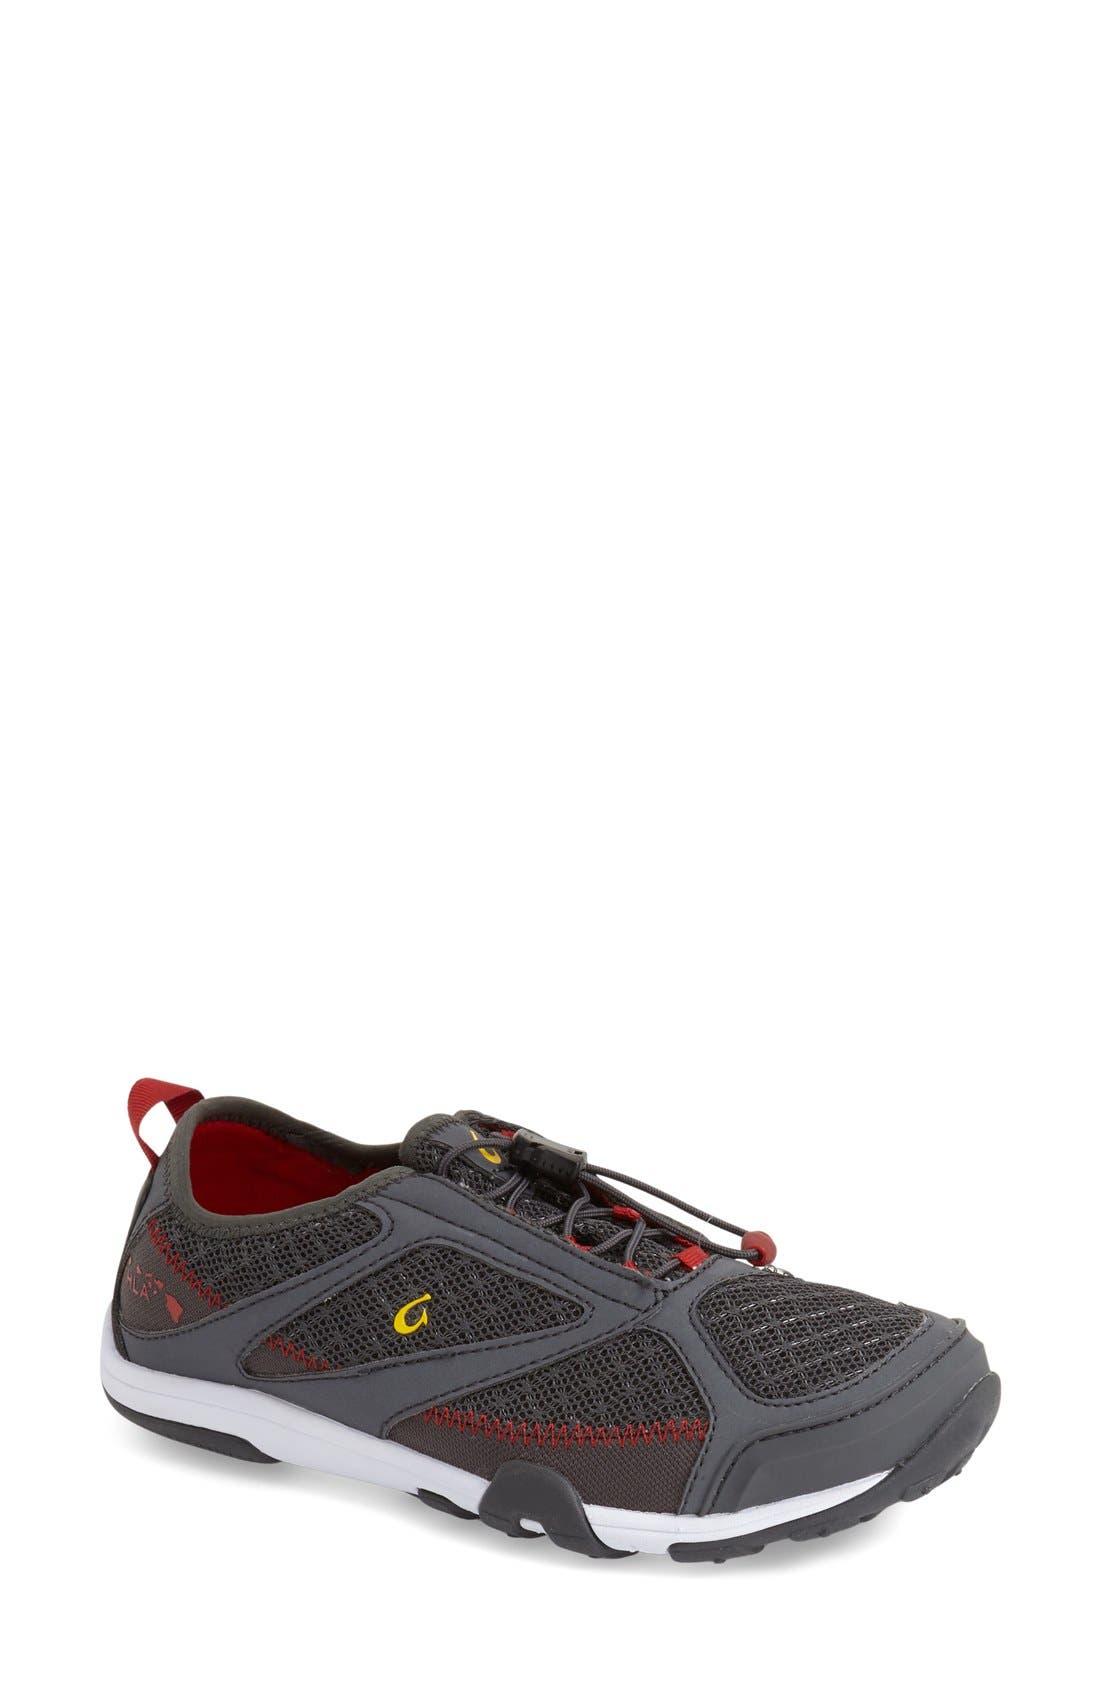 Main Image - OluKai 'Eleu' Water-Resistant Sneaker (Women)